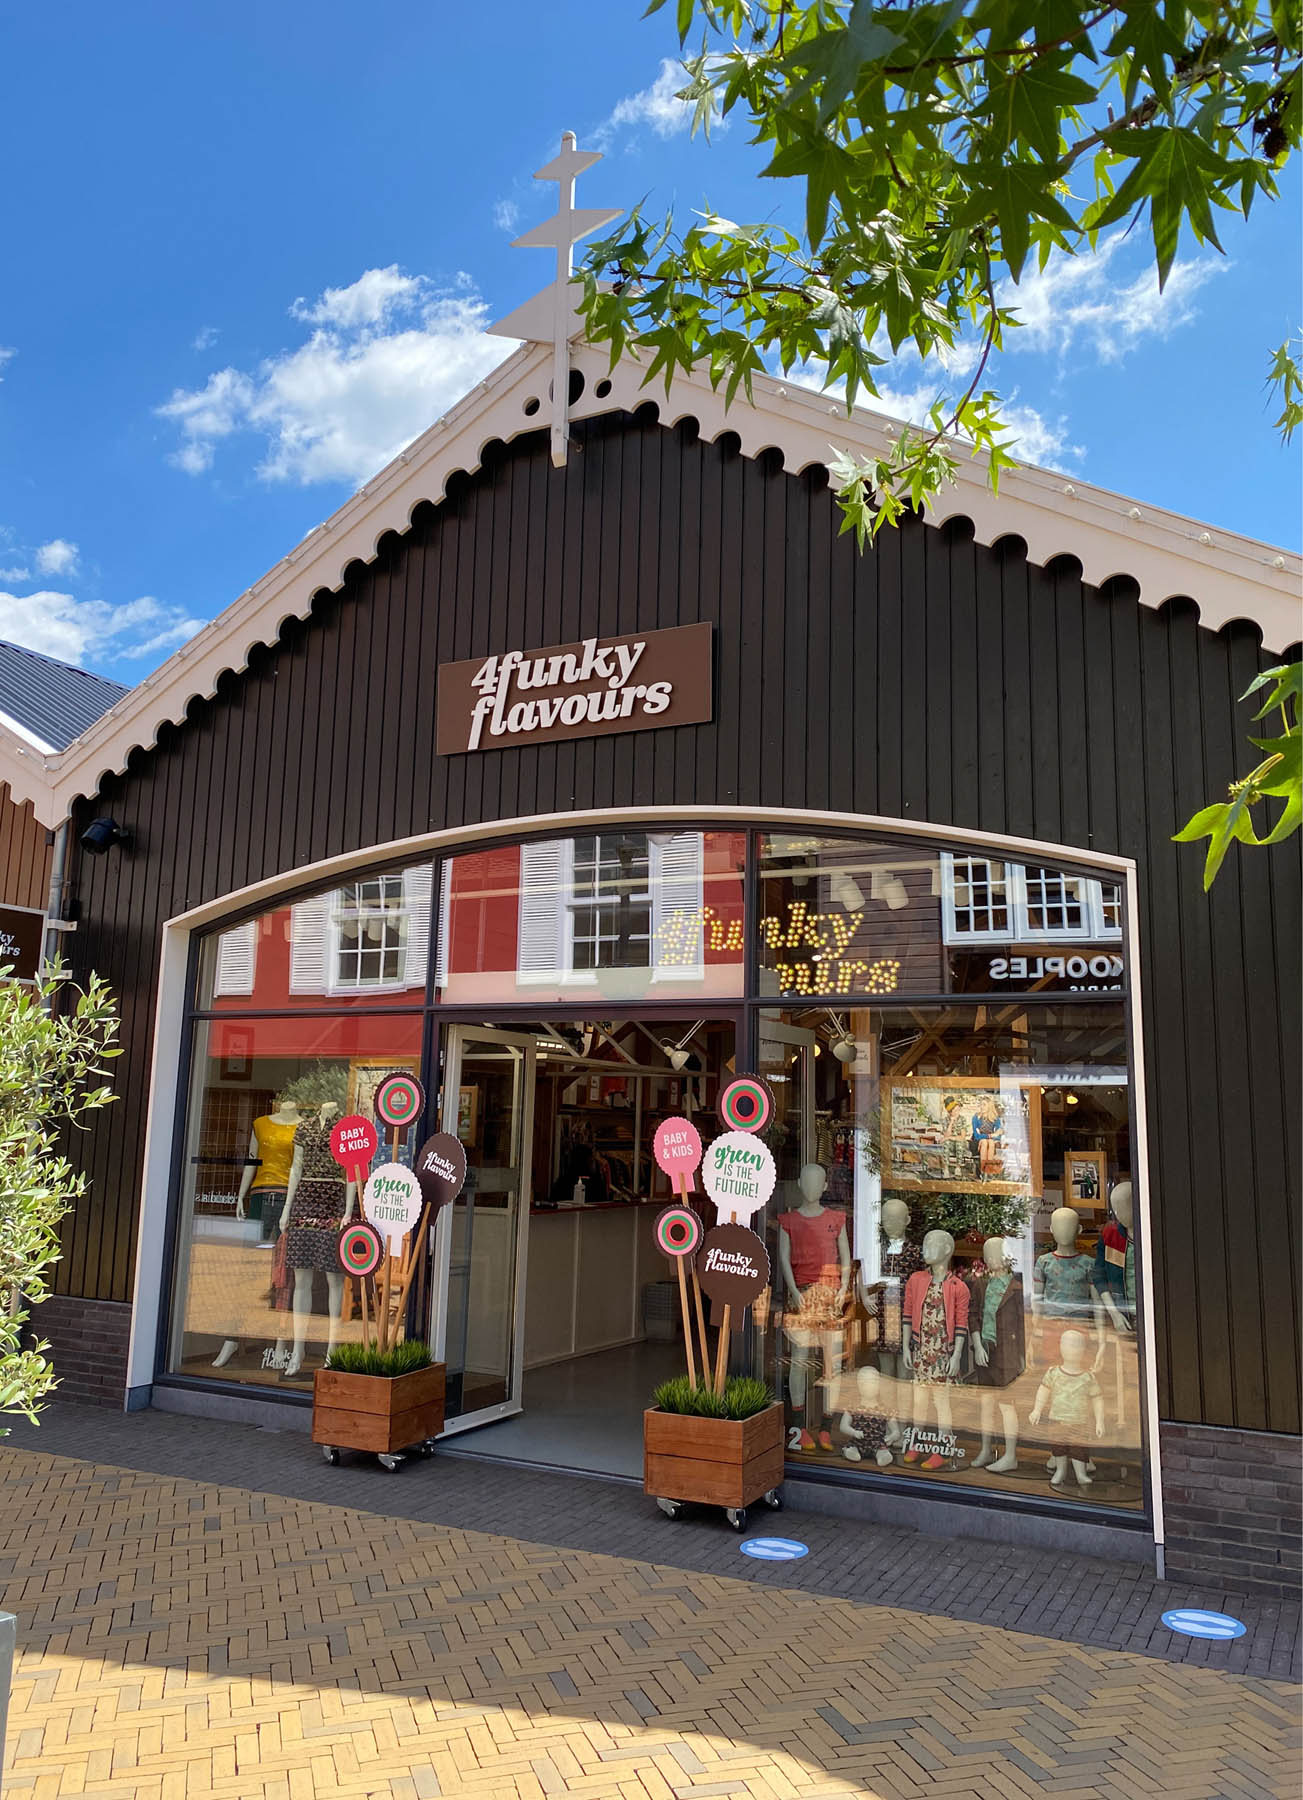 4funkyflavours Designer Outlet Roosendaal